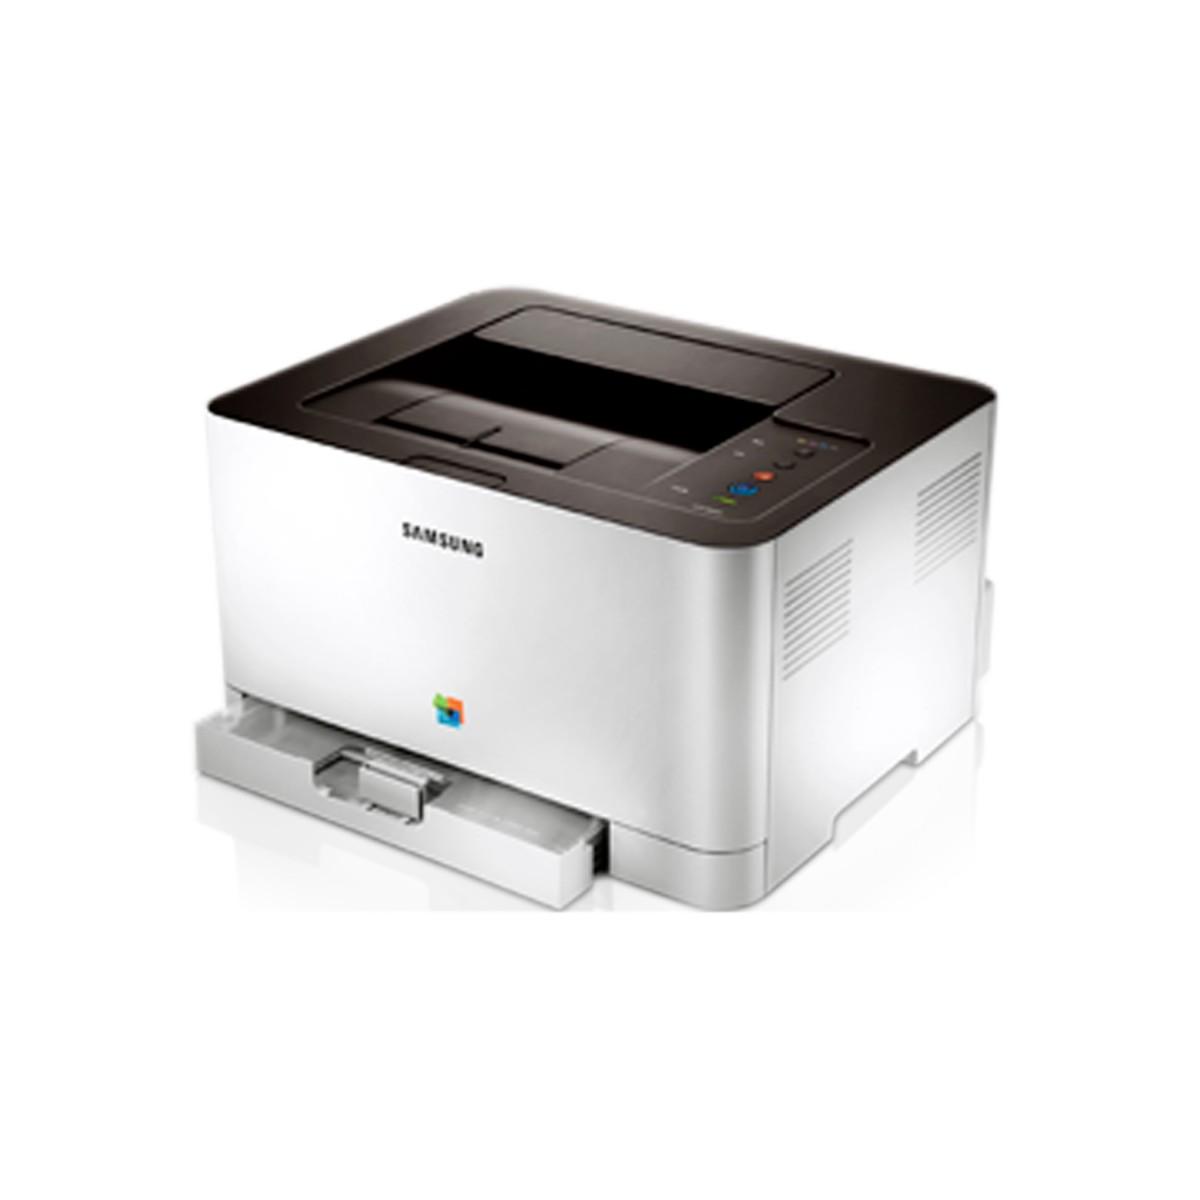 Impressora Laser Color CLP-365W/XAB 110V - Samsung